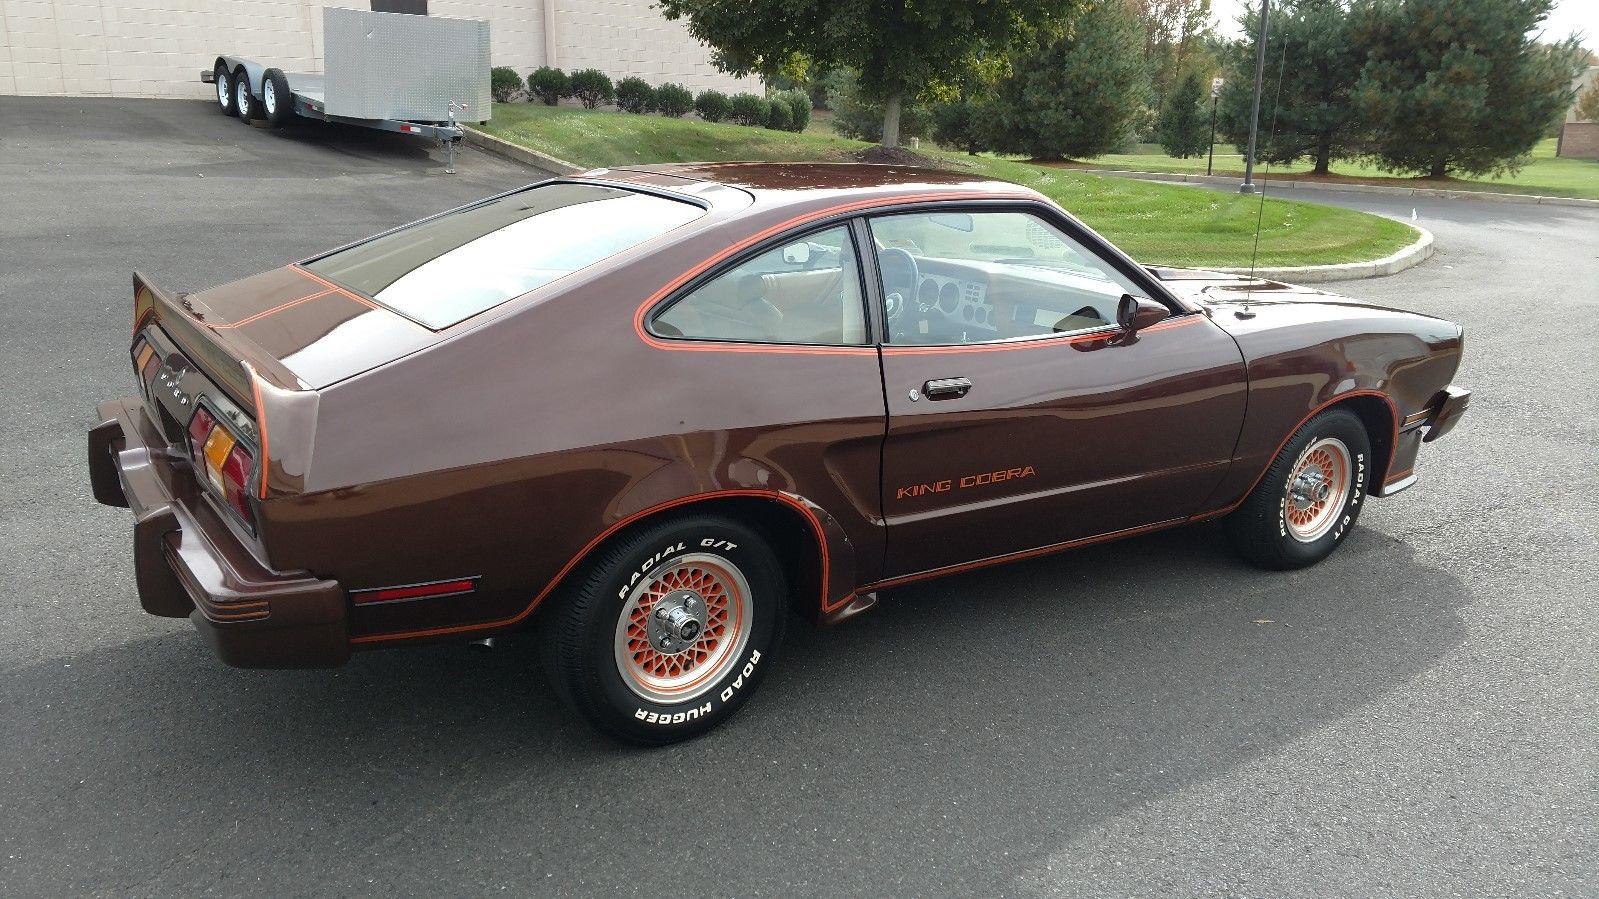 1978 Ford Mustang II King Cobra profile